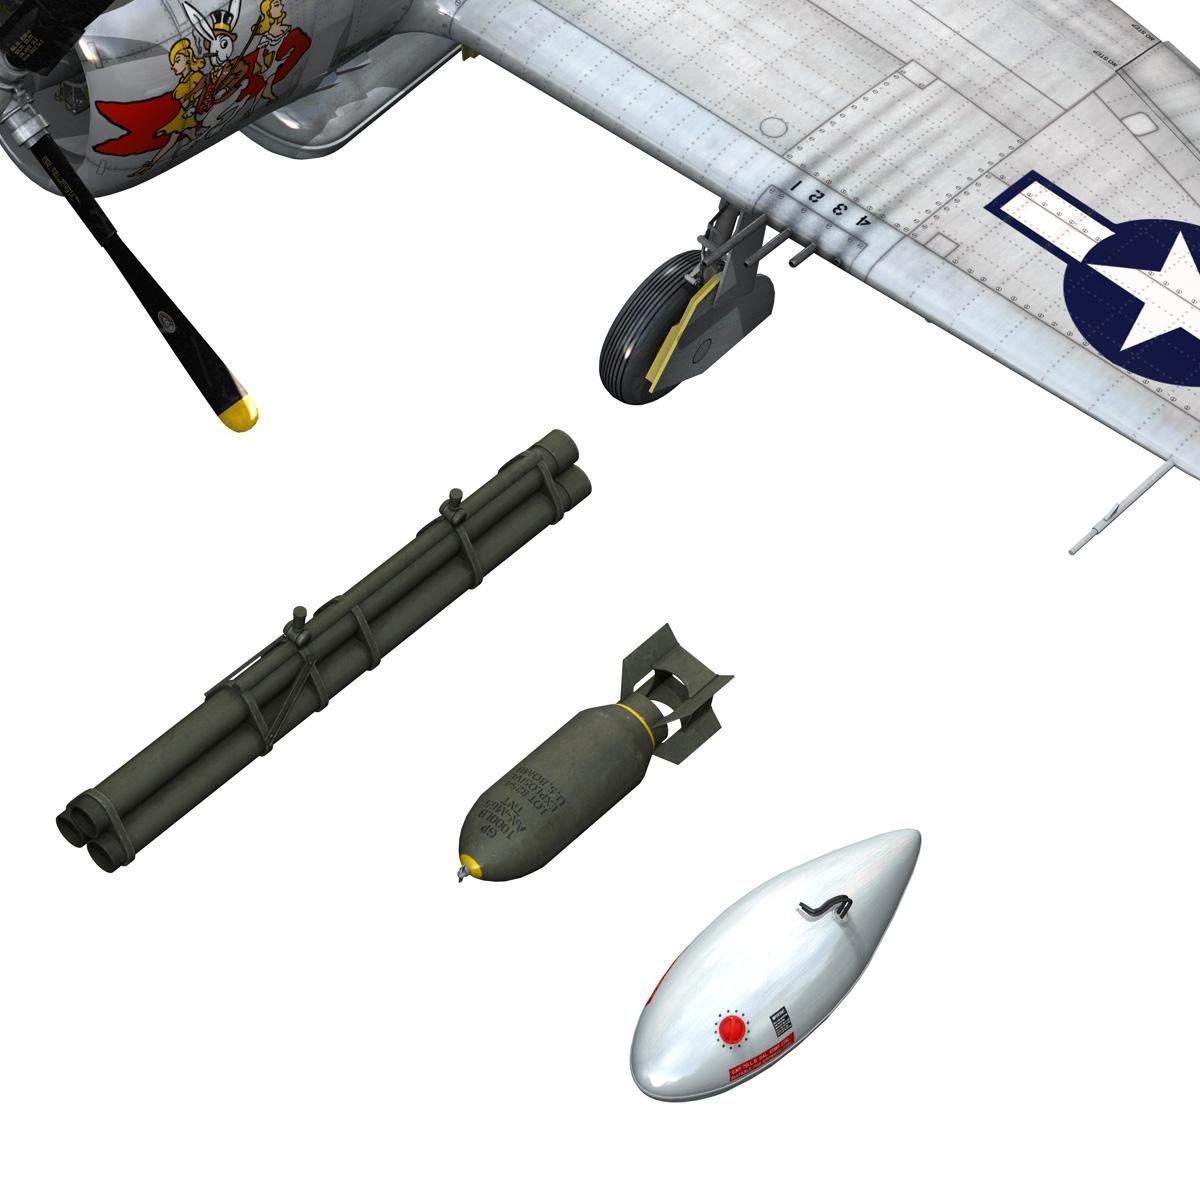 republic p-47 thunderbolt – daddy rabbit 3d model fbx c4d lwo obj 272705